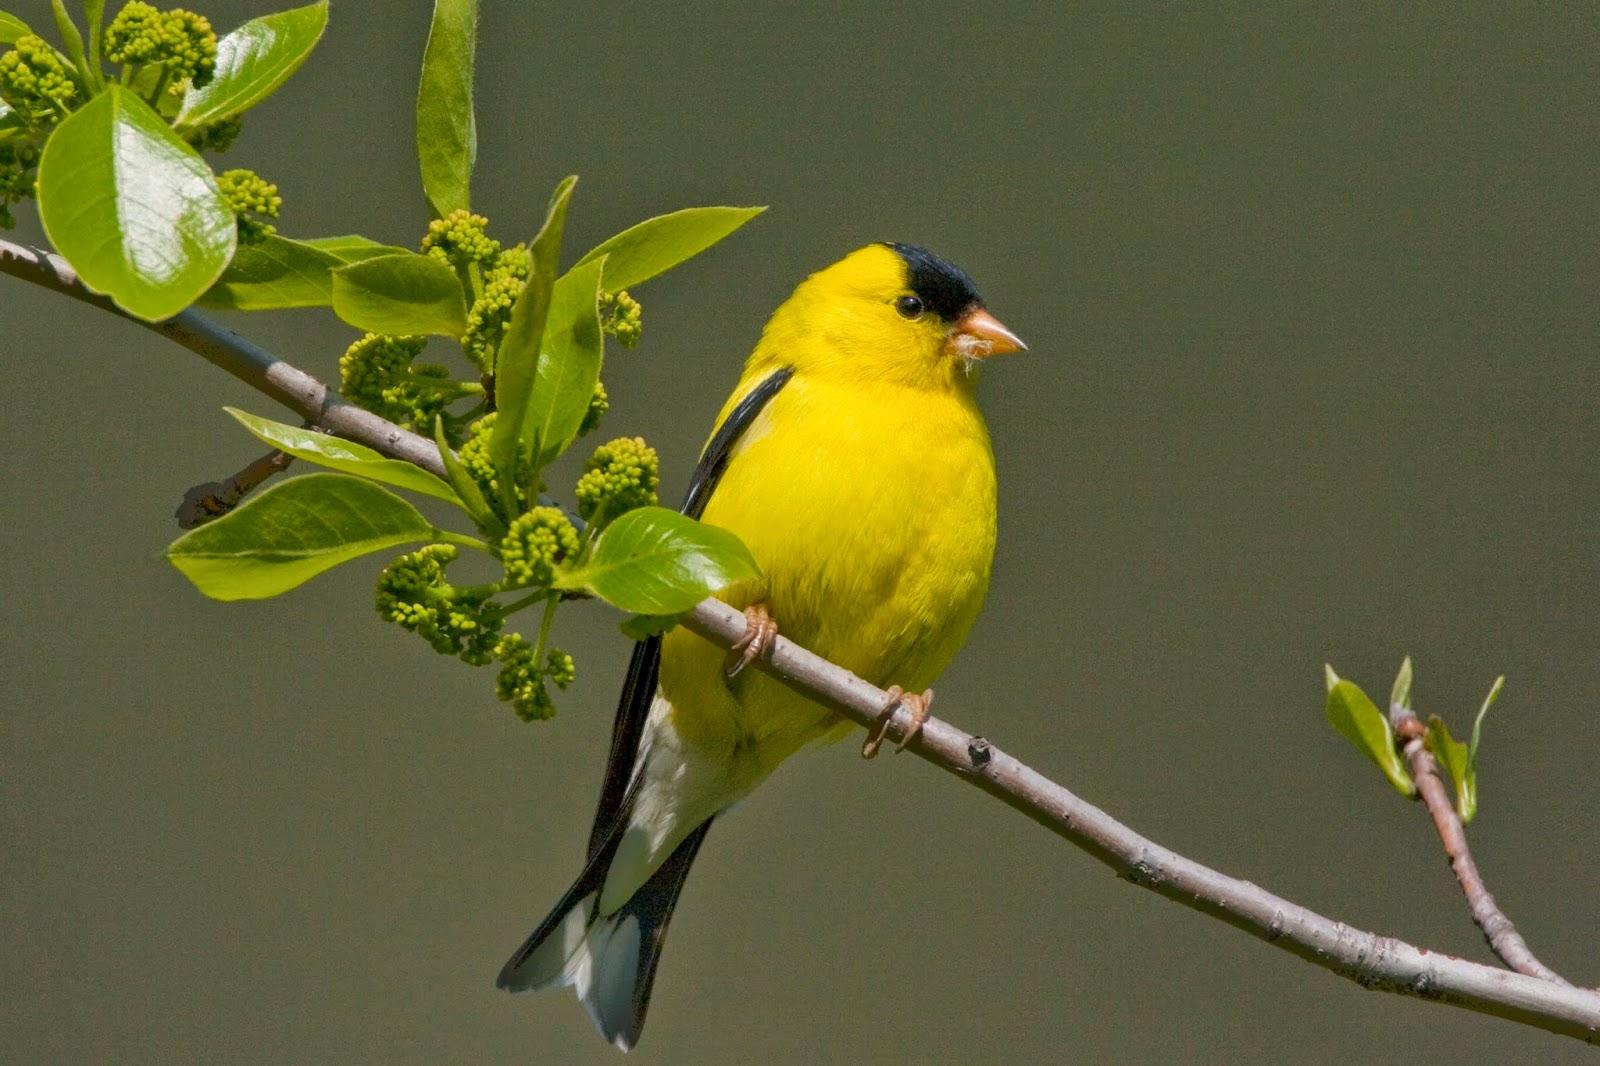 spring bird on a - photo #21